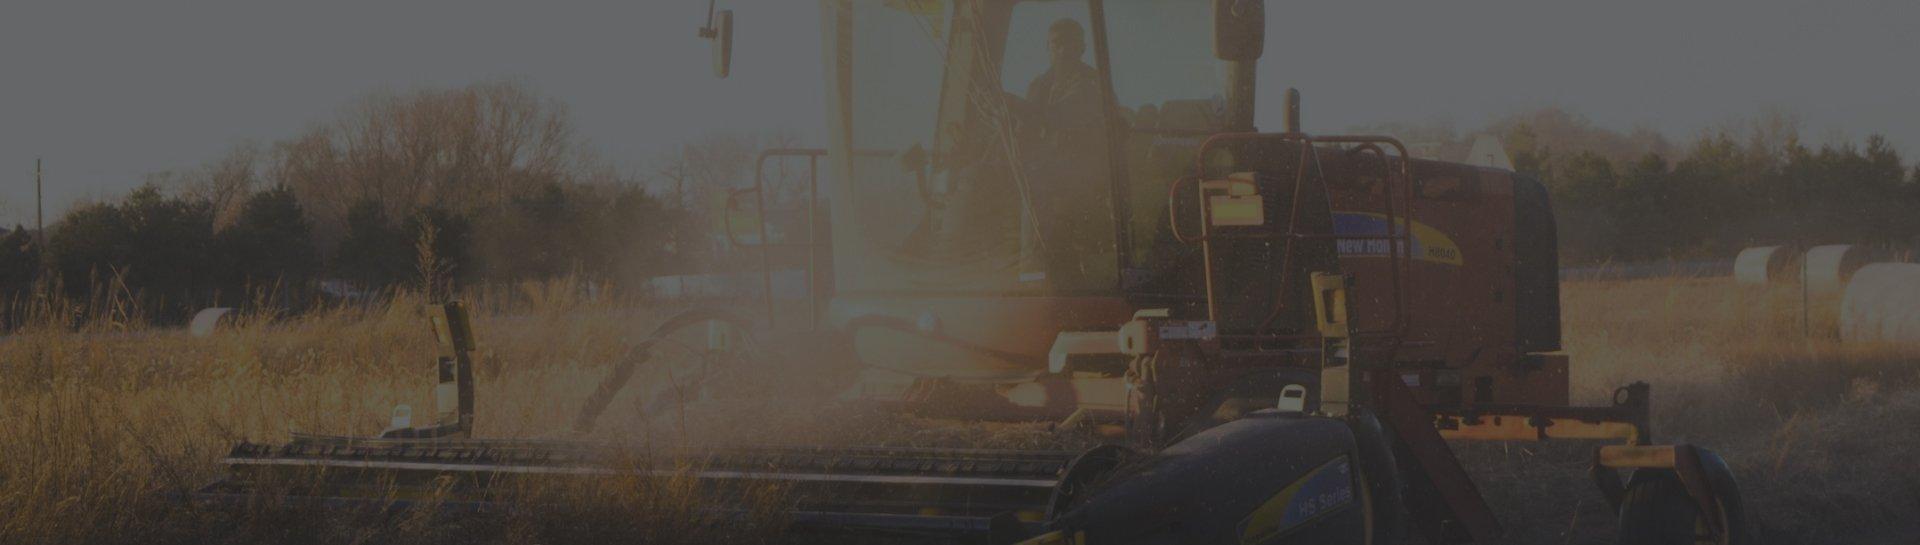 OOO SELL-AGRO– надёжный партнёр Вашего бизнеса